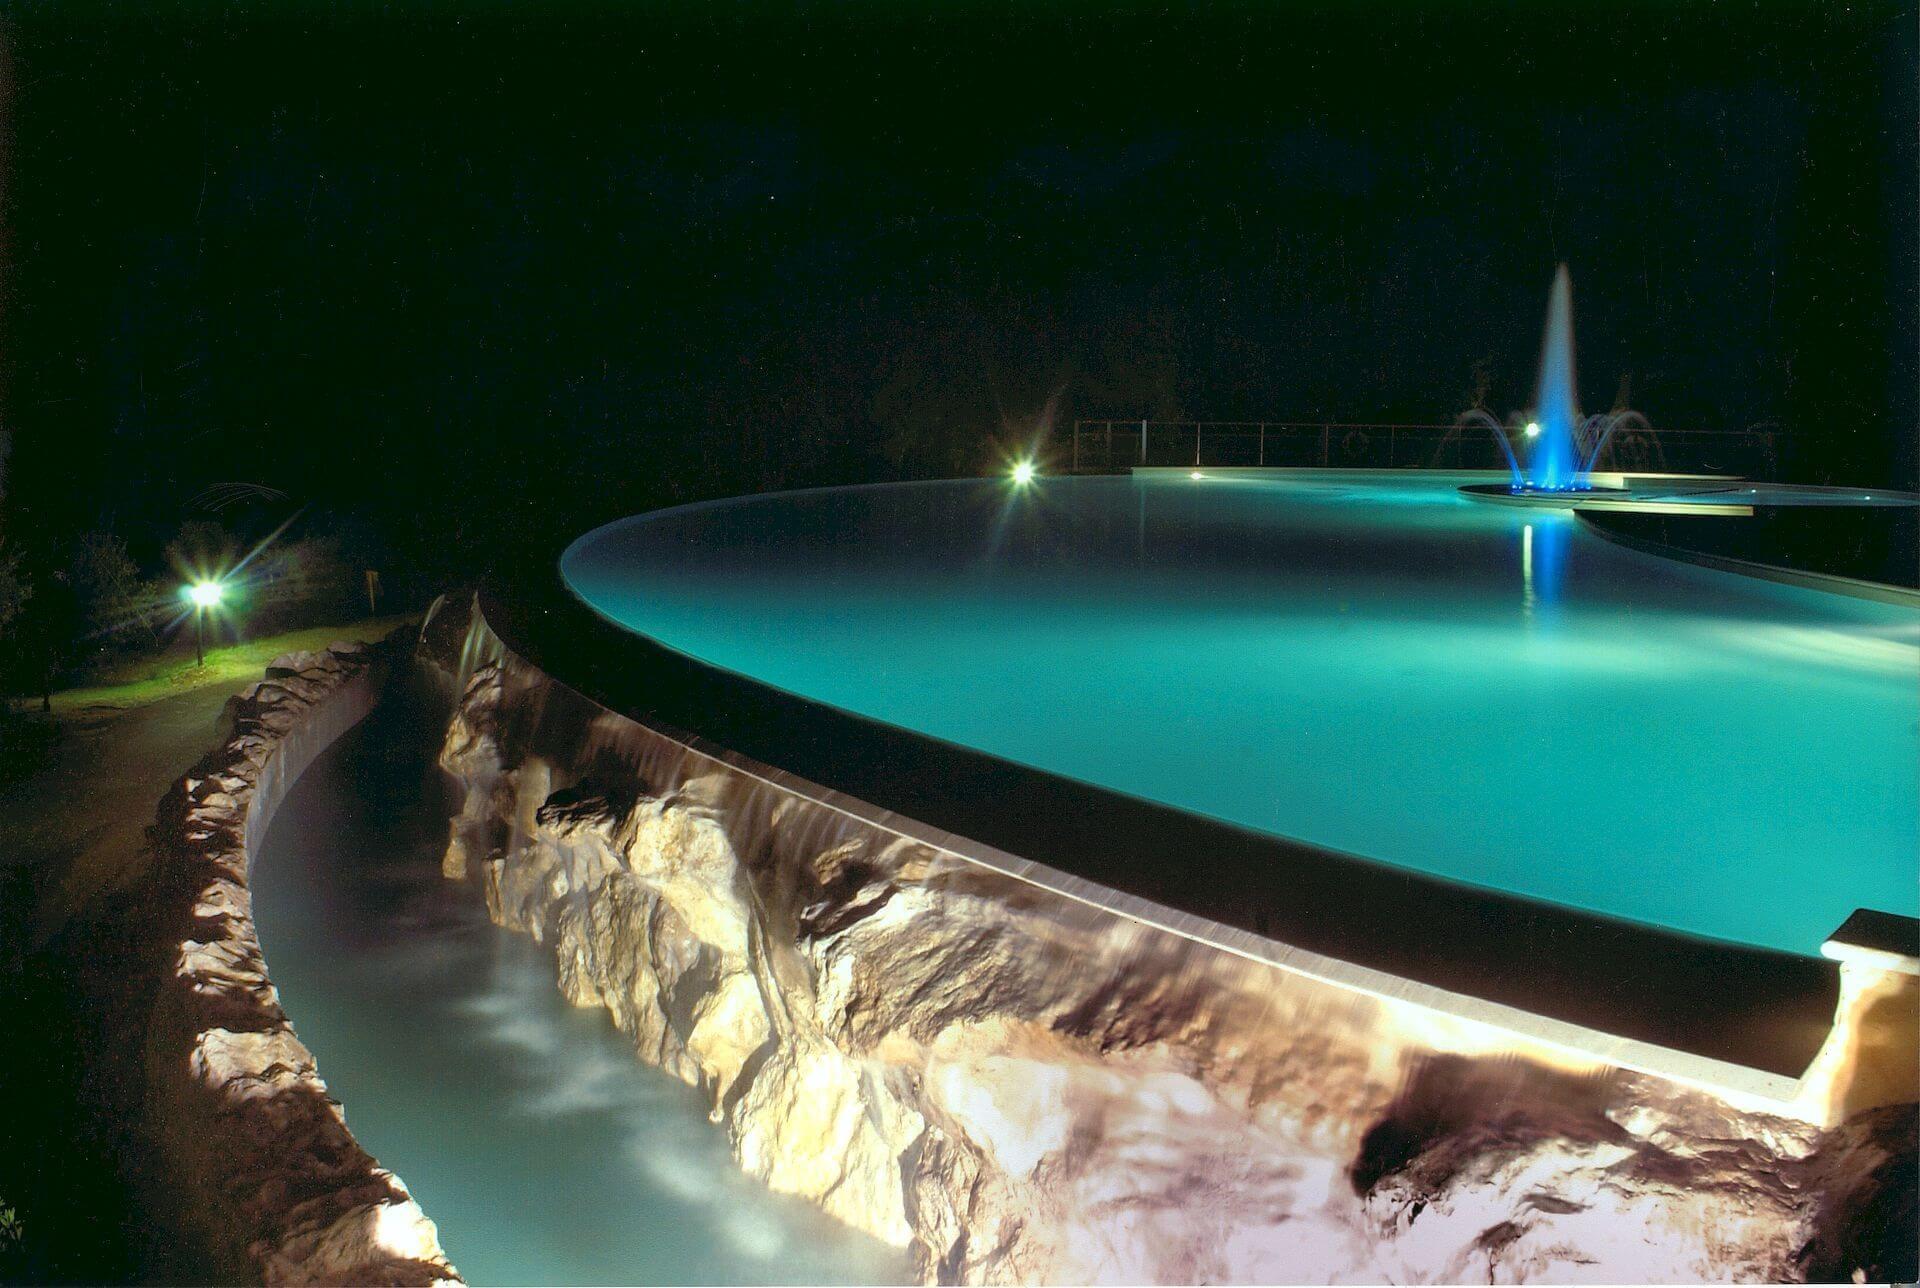 piscina con le rocce